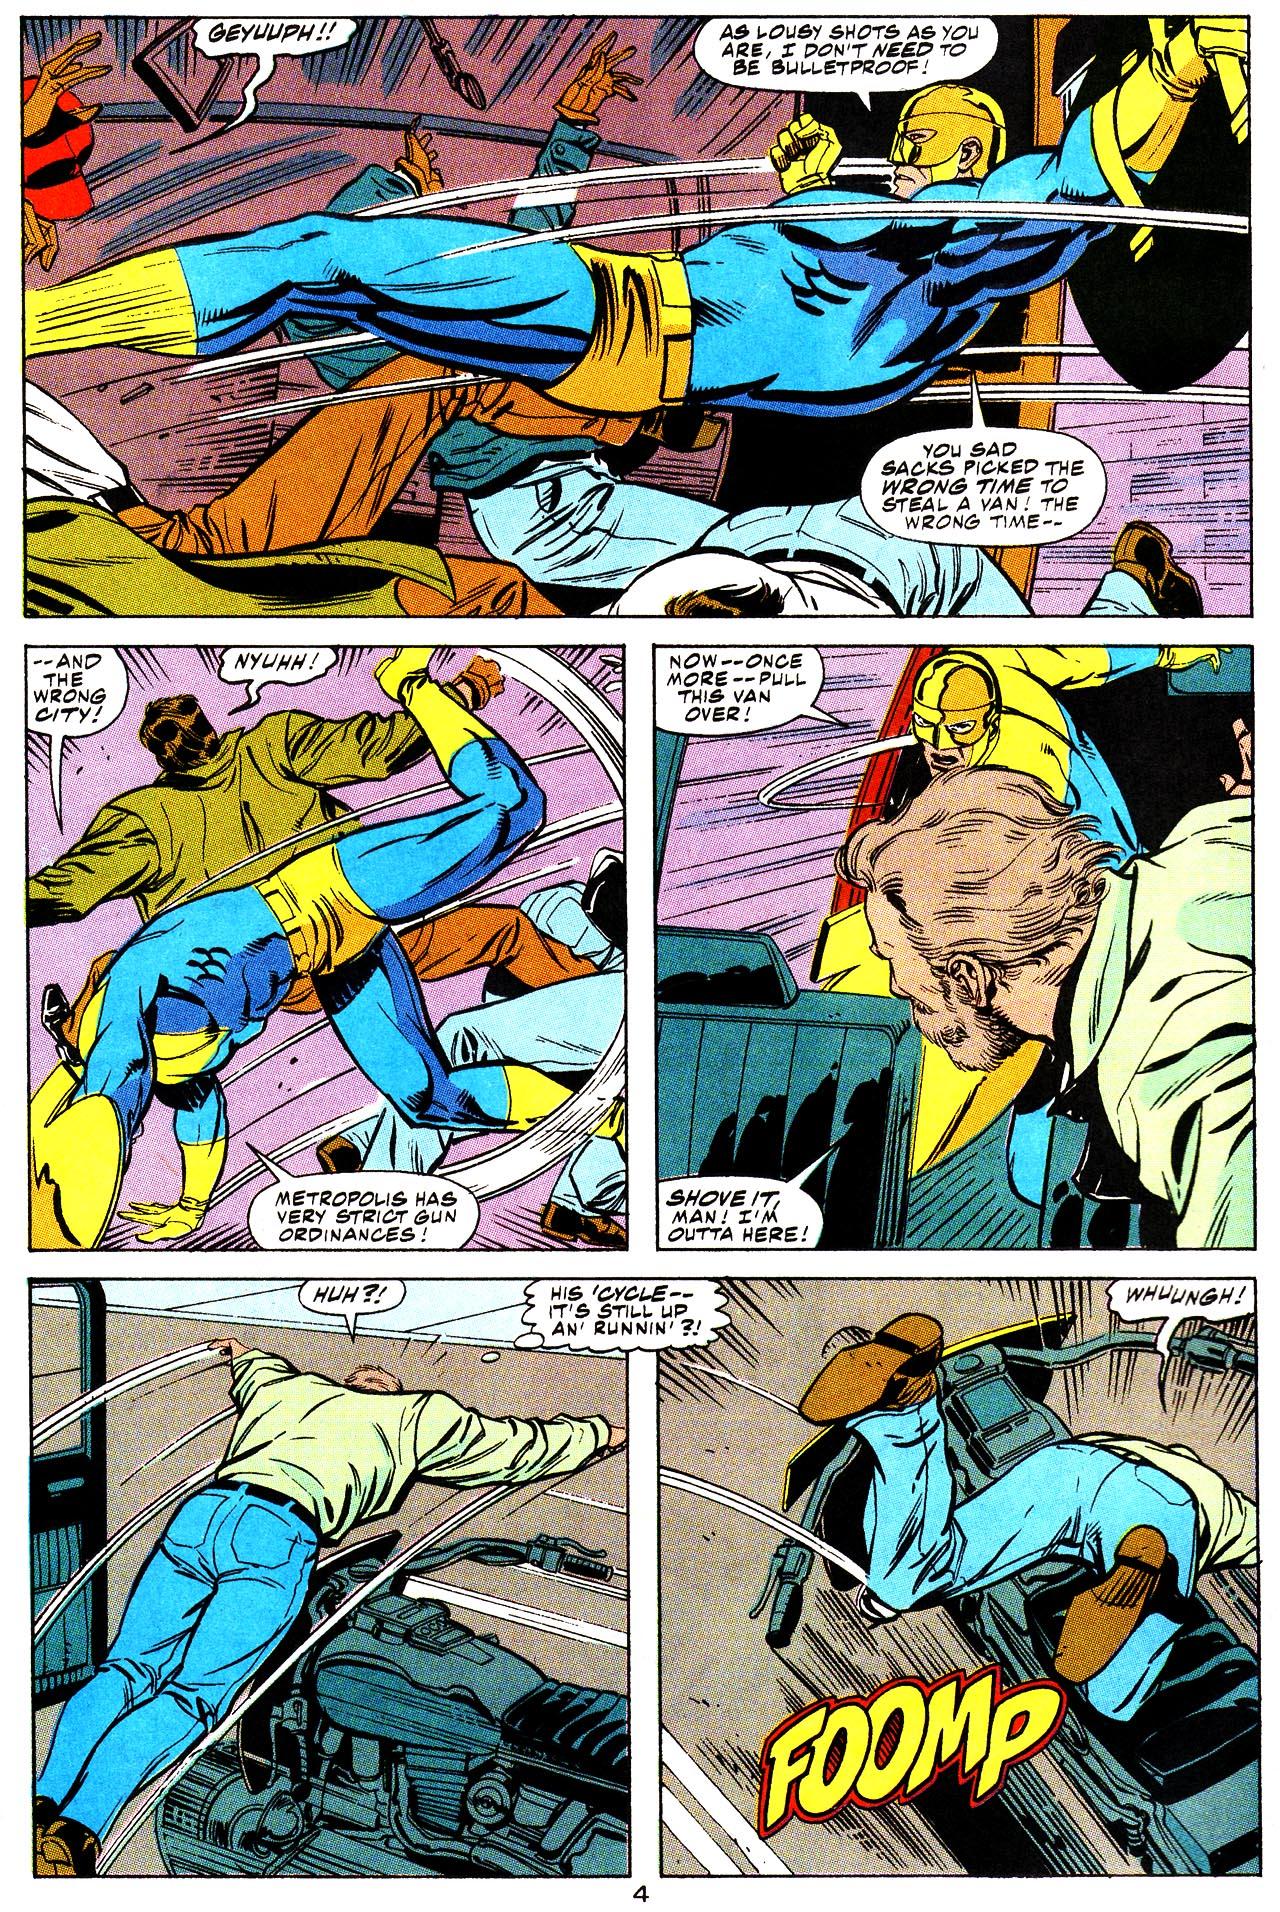 Action Comics (1938) 686 Page 4